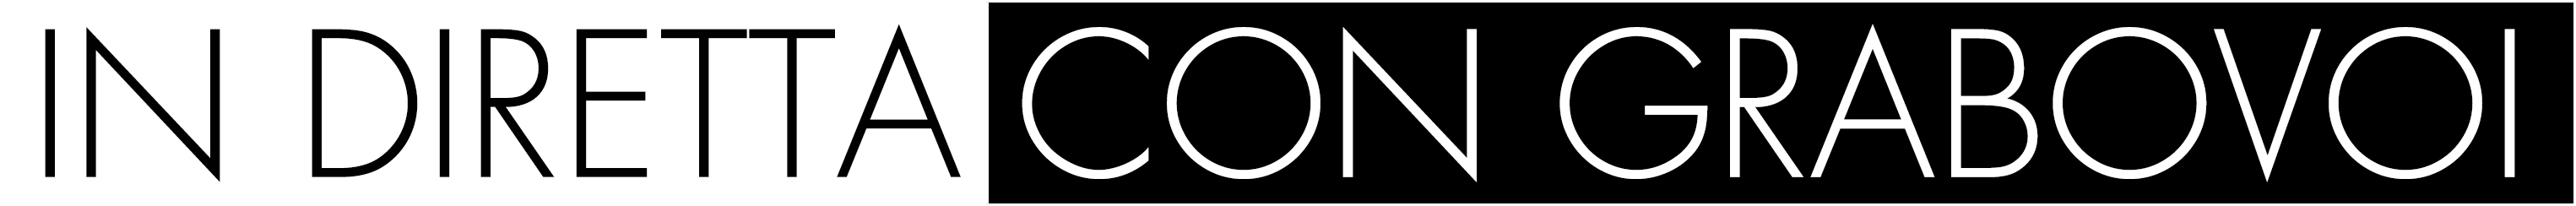 IndirettaconGrabovoi_logo